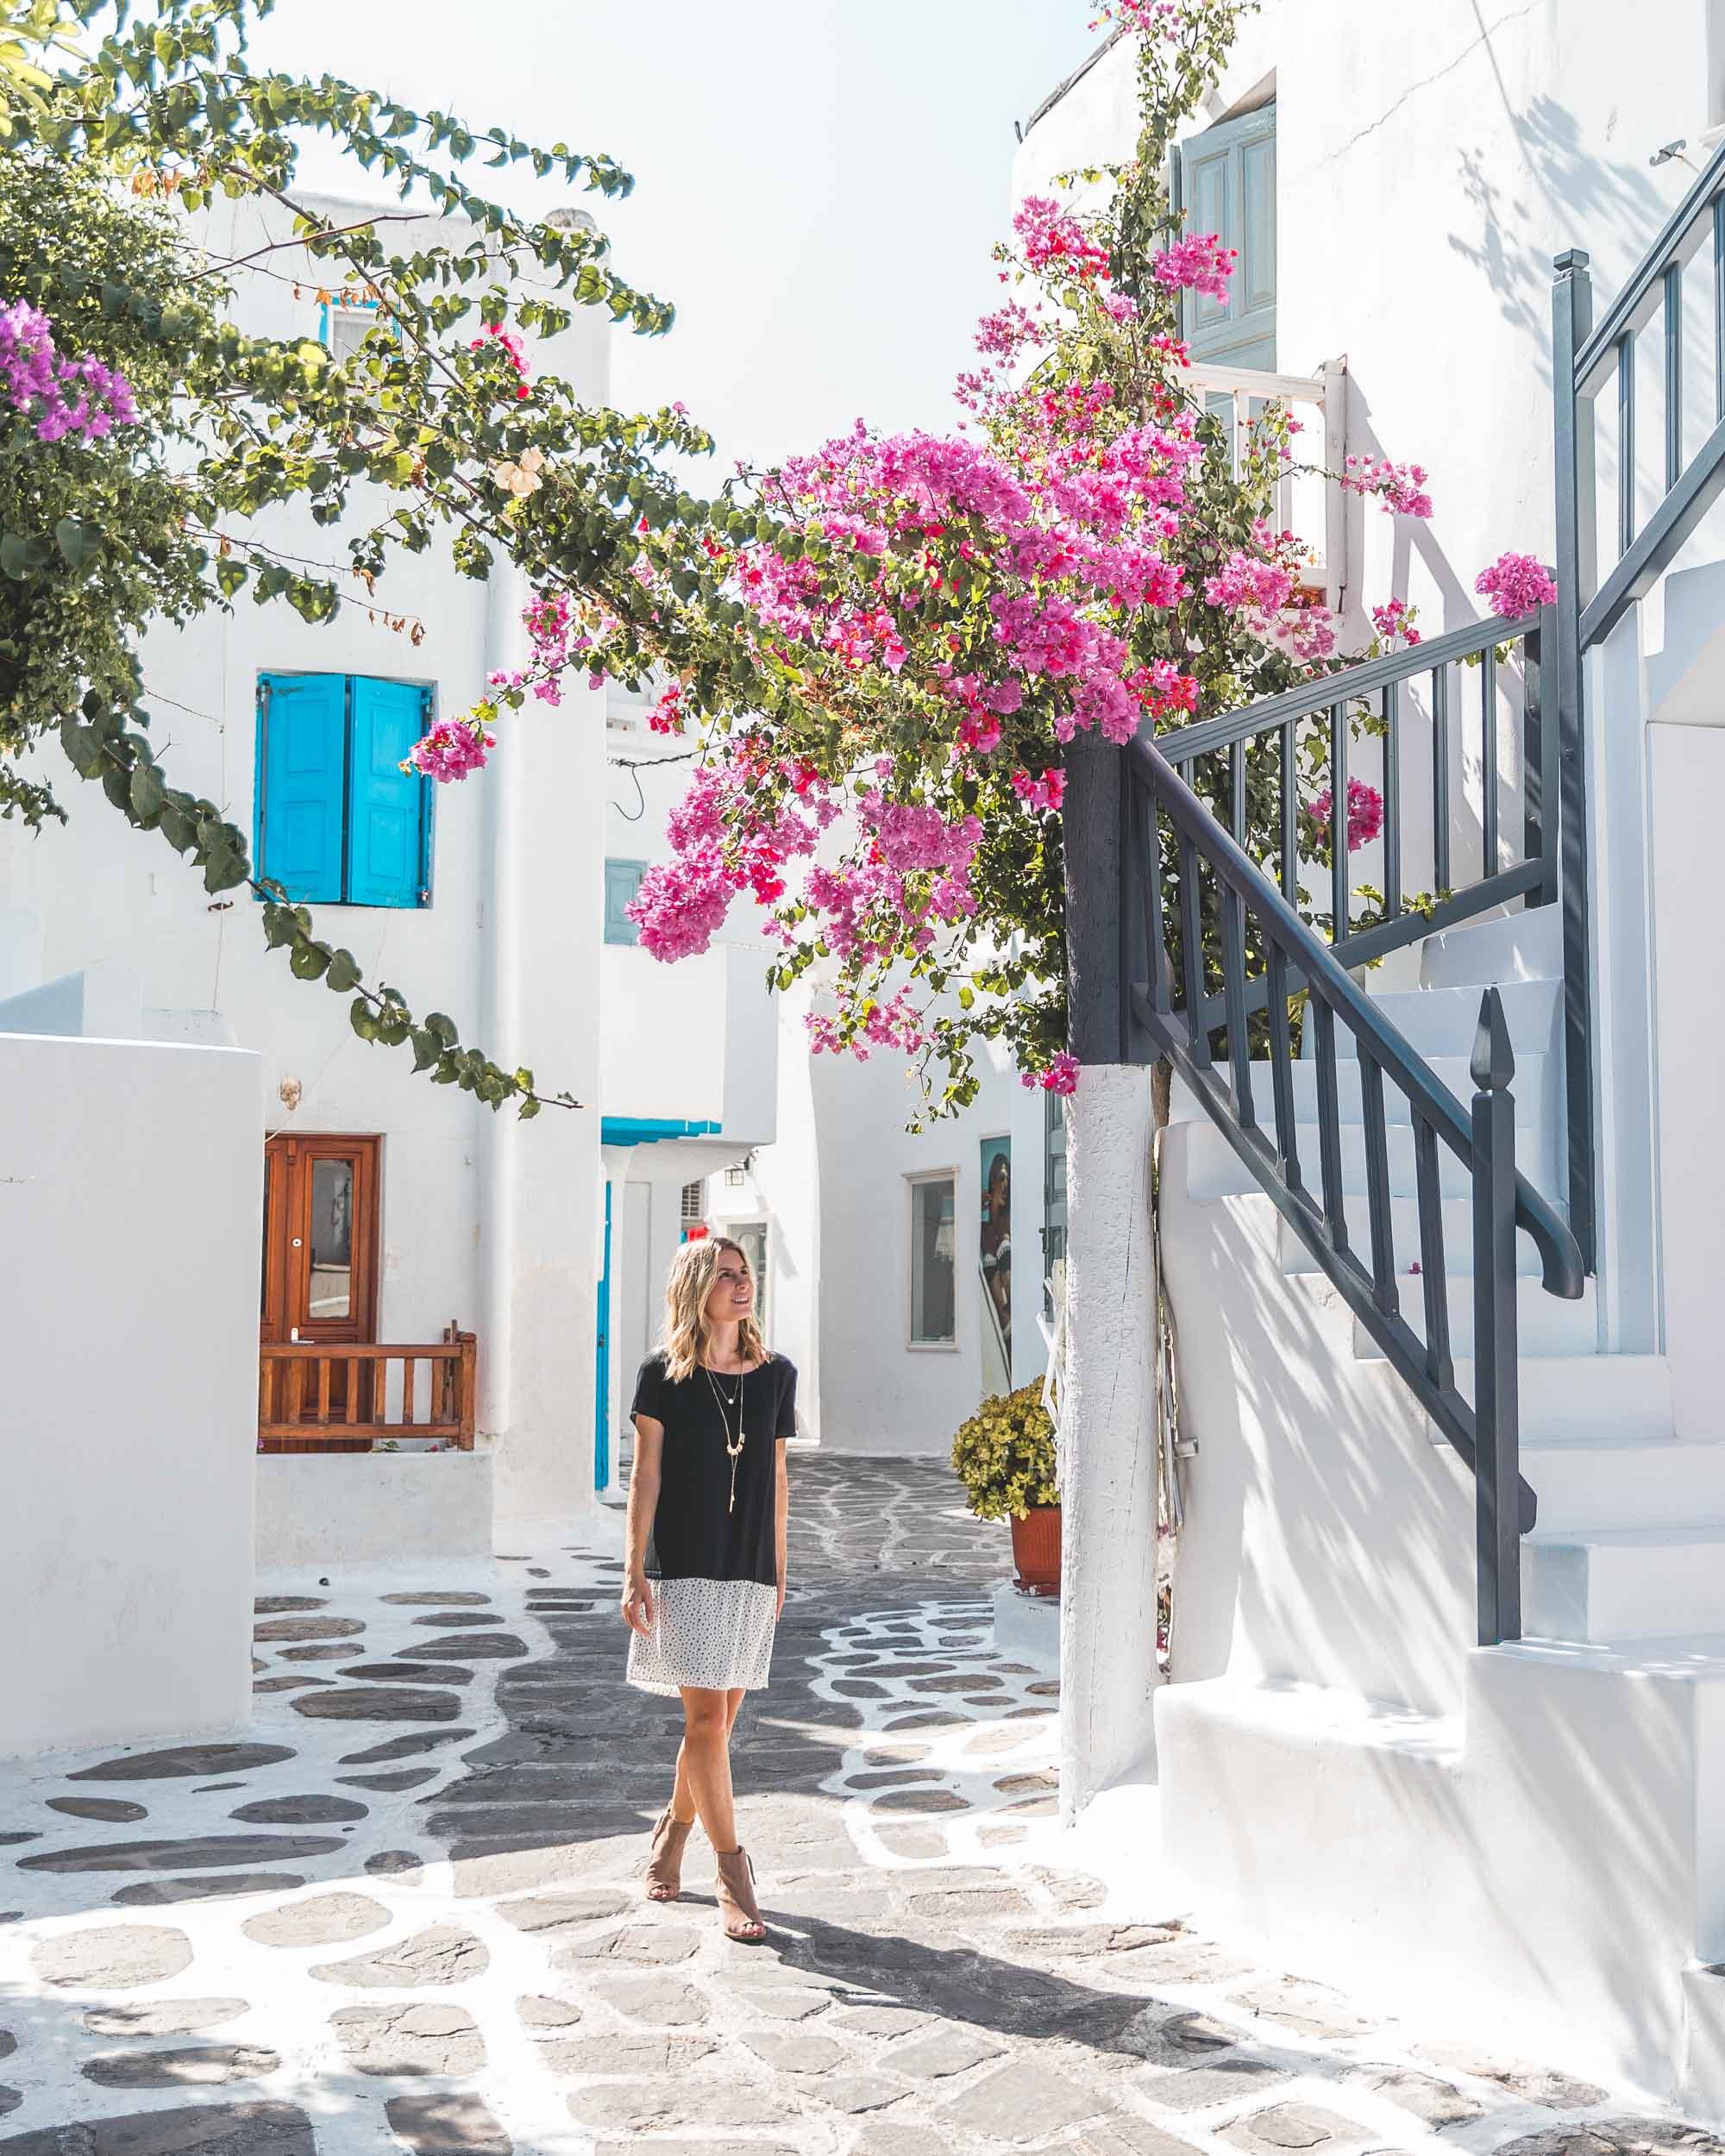 Downtown mykonos cobblestone streets and pink flowers white houses blue doors greek islands greece